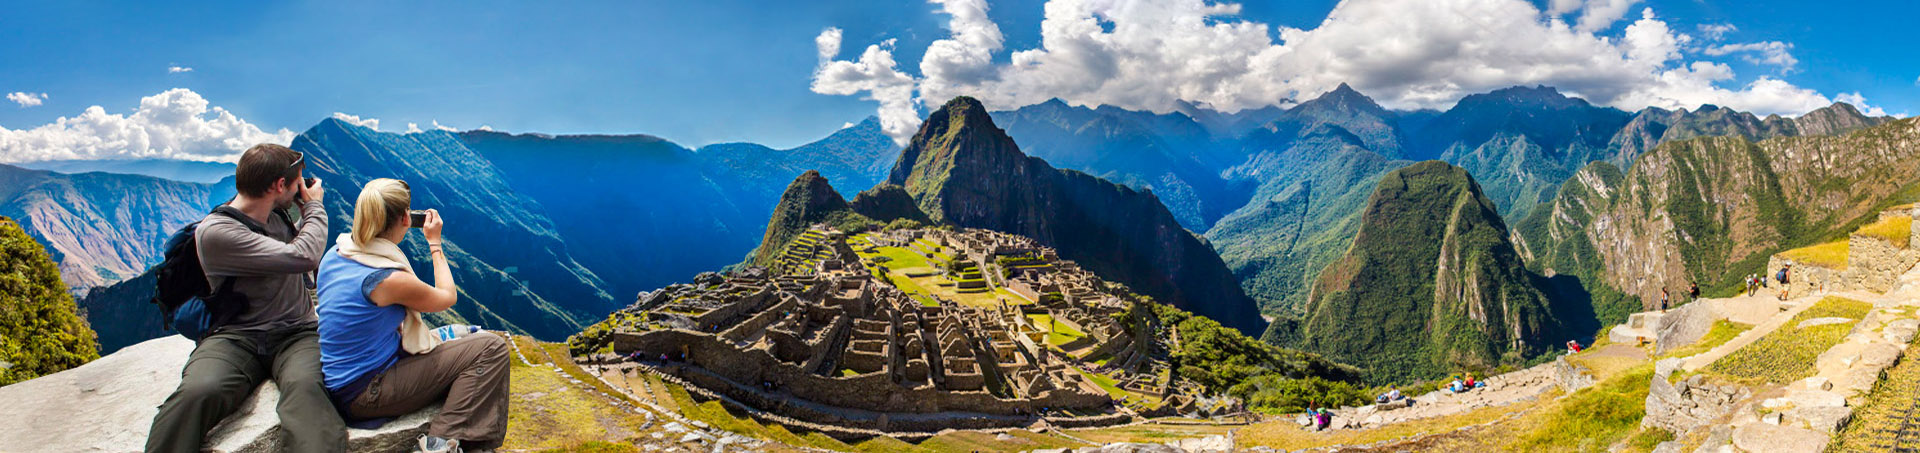 Zuid-Amerika maand